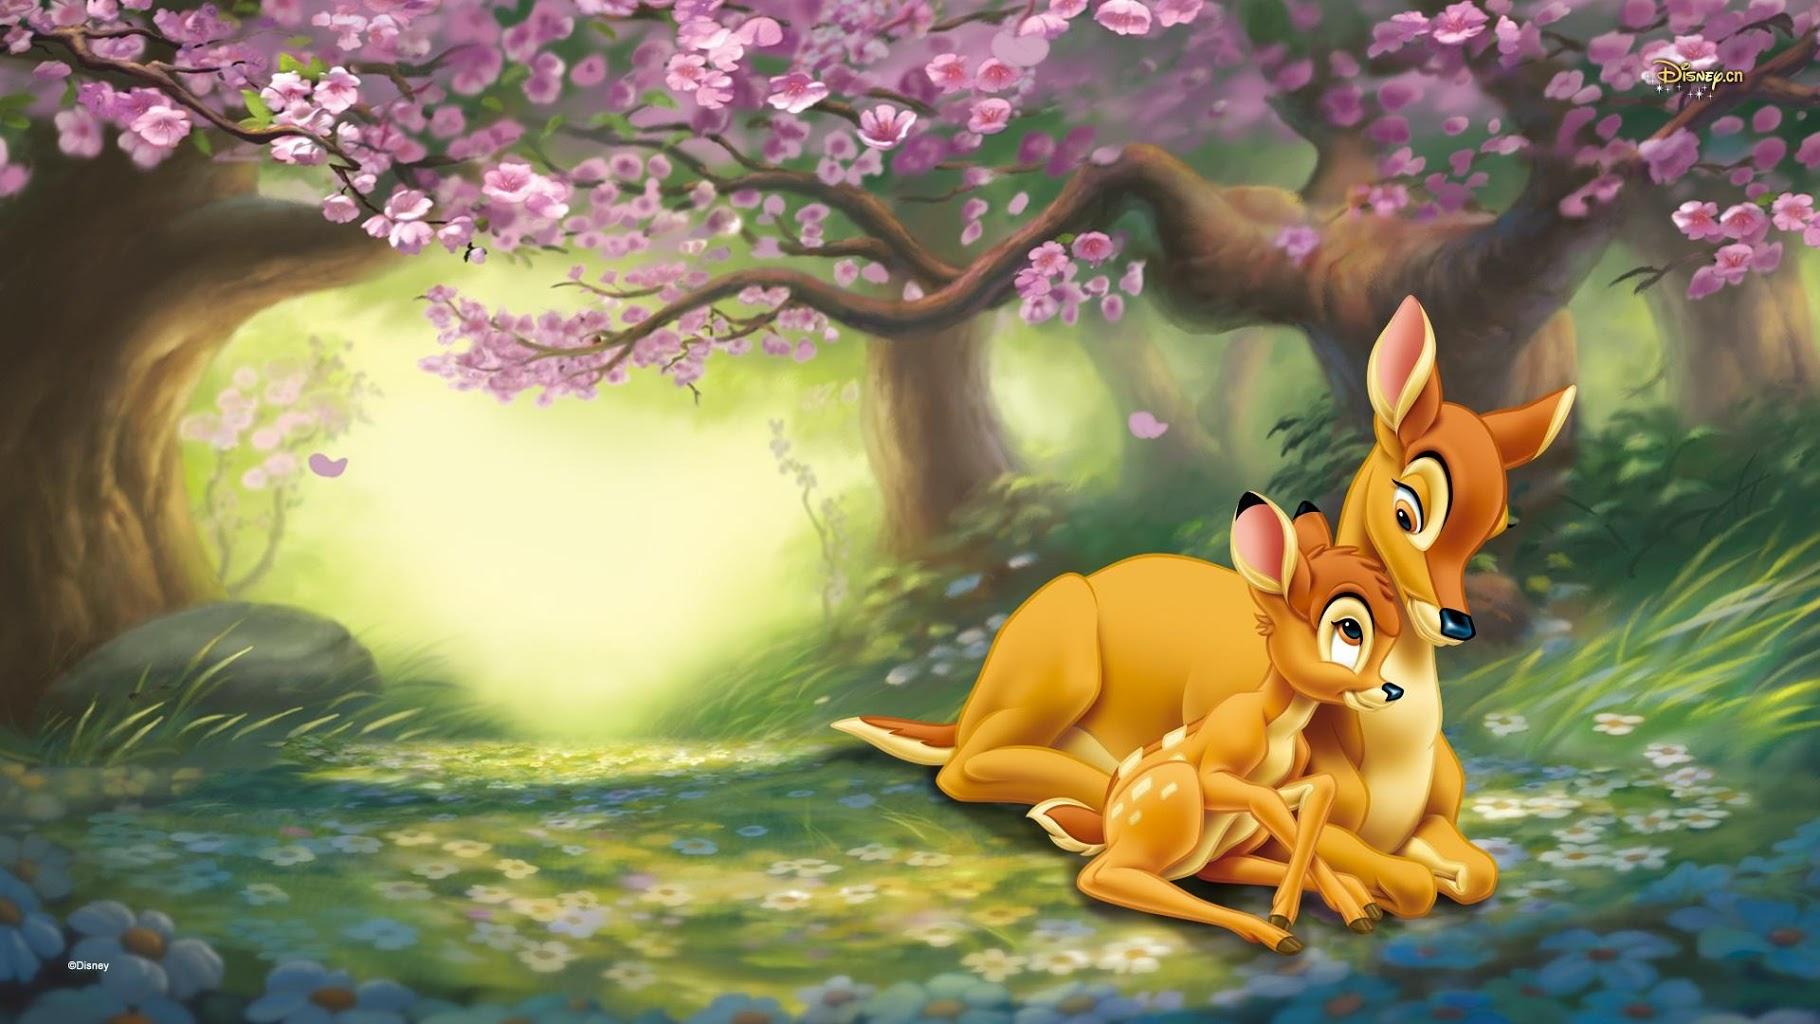 Bambi Wallpaper 16817 1820x1024 Px  HDWallSourcecom